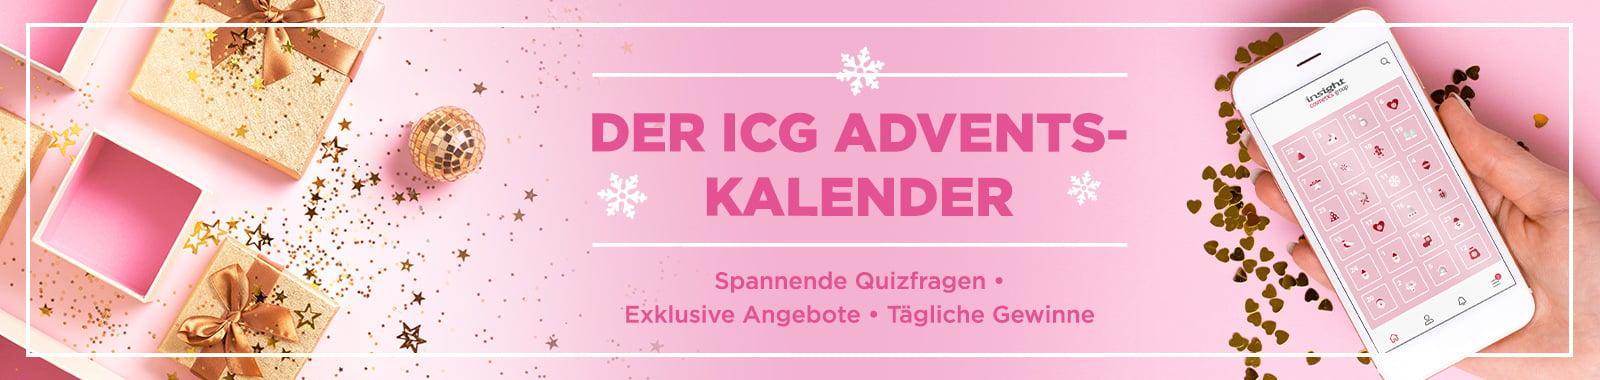 ICG_XMas-Calendar_Webshop-Frontpage-Banner_Launch_1600x380_DACH